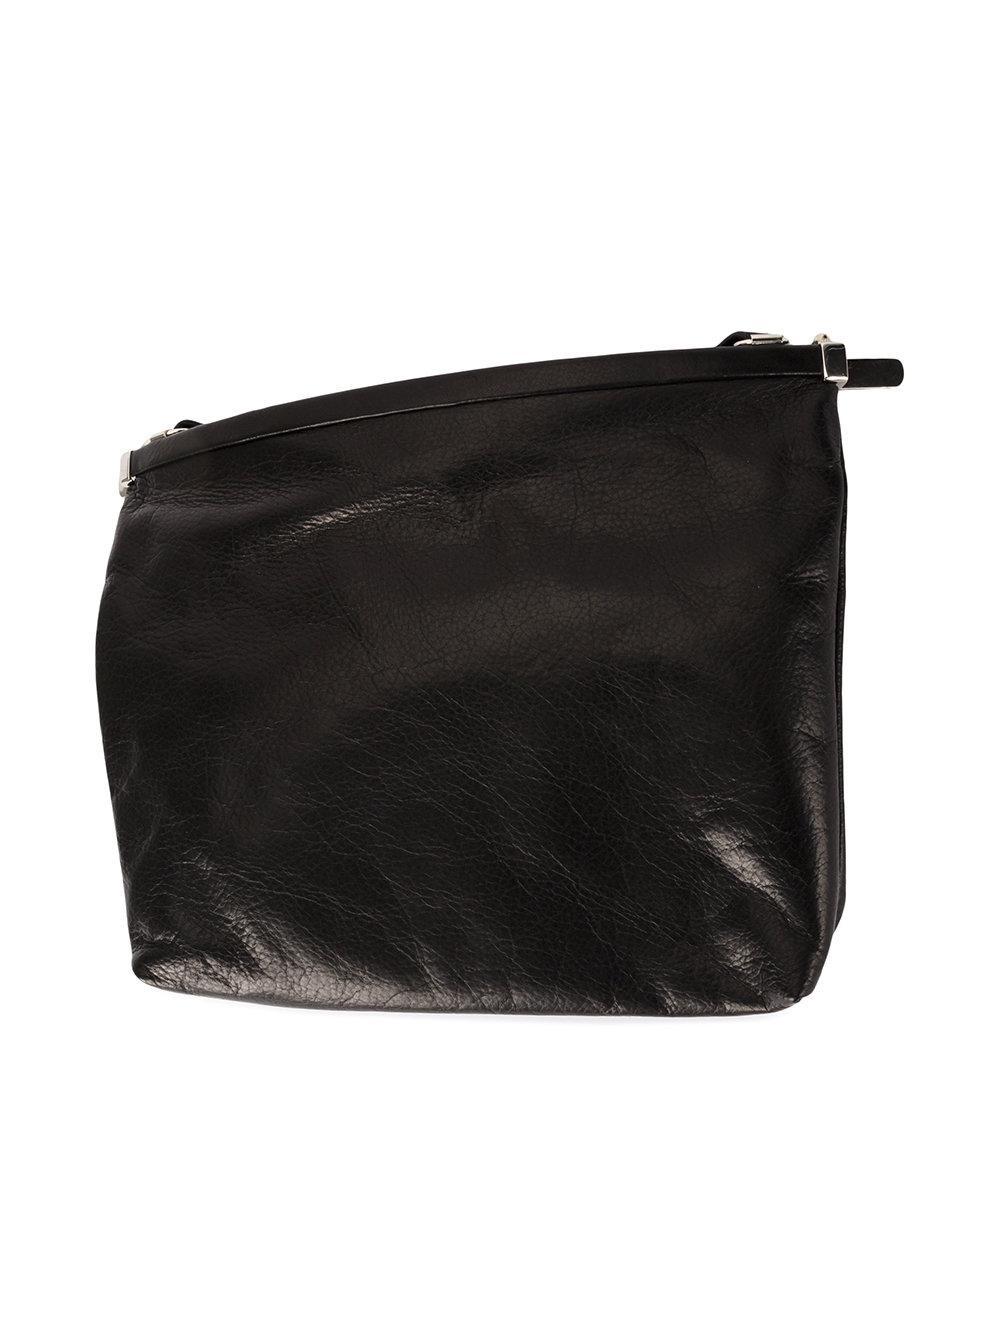 top zip shoulder bag - Black Ann Demeulemeester nrXiE